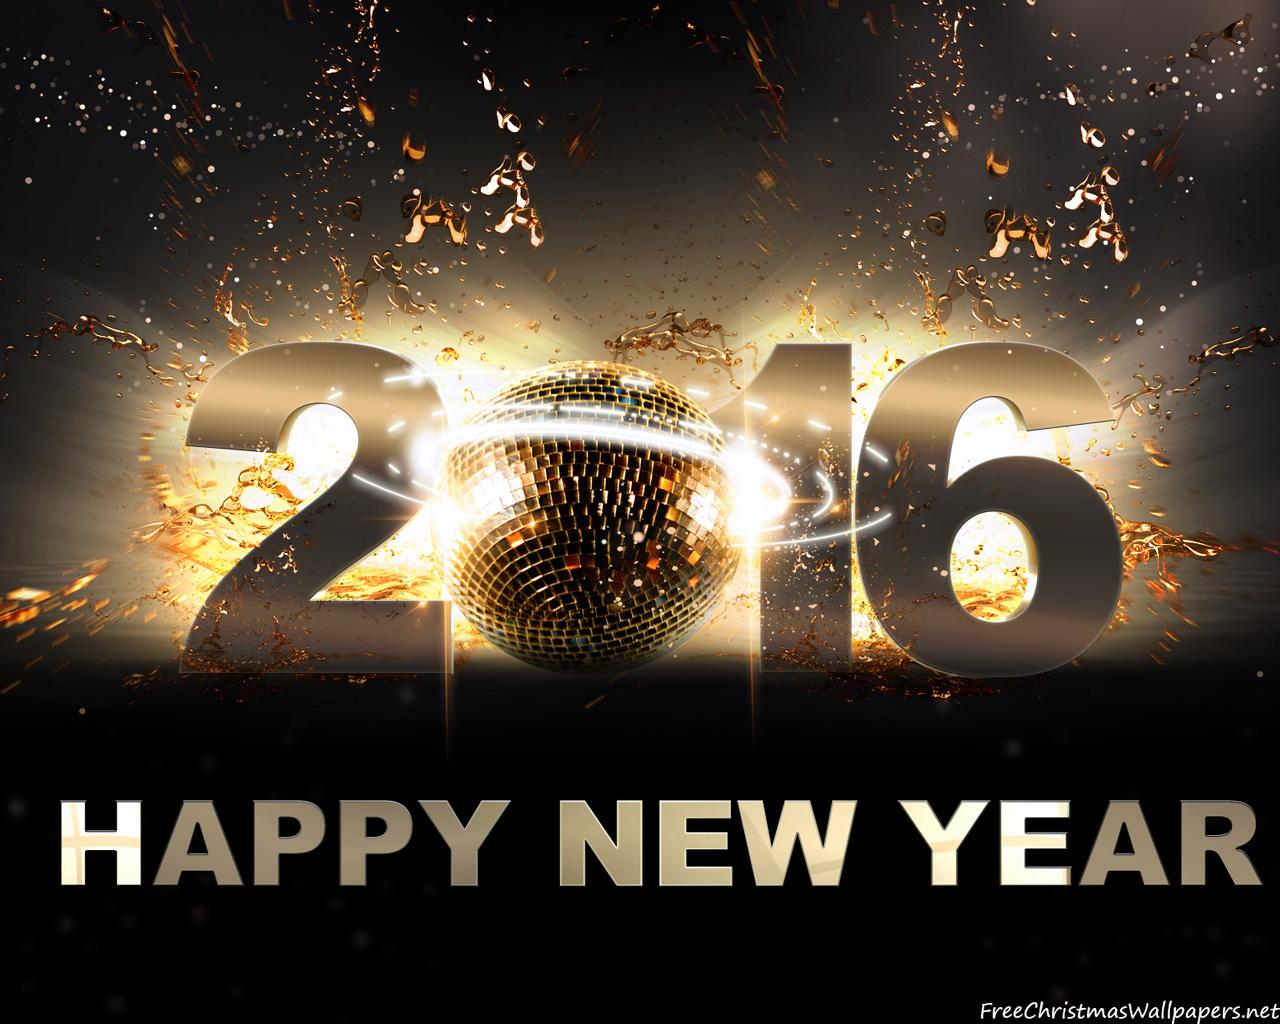 Download 2016 Happy New Year 1600x1200 1920x1080 1920x1200 1280x1024